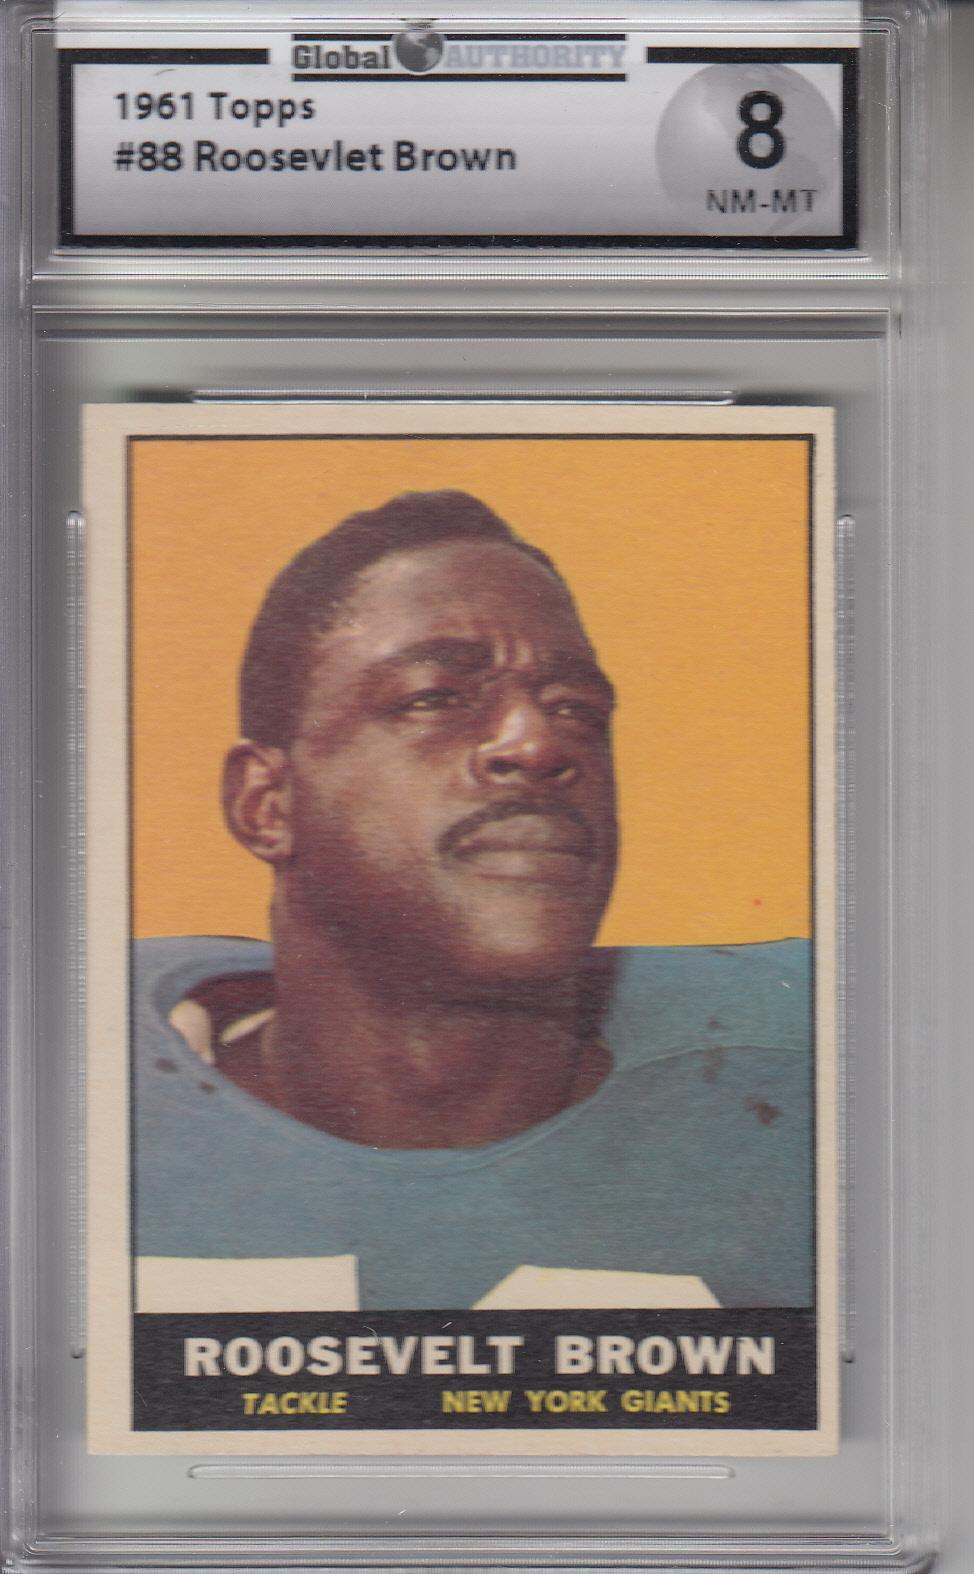 1961 Topps #88 Roosevelt Brown GIANTS GAI 8 NM-MT Z20443